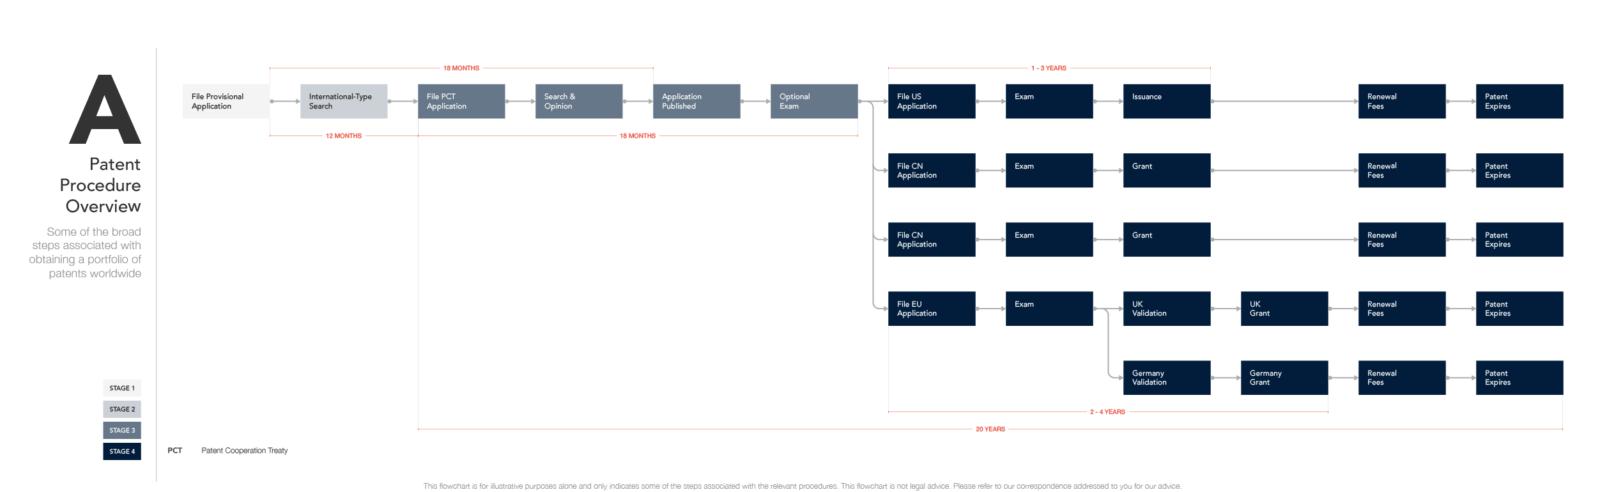 Patent Procedure Overview